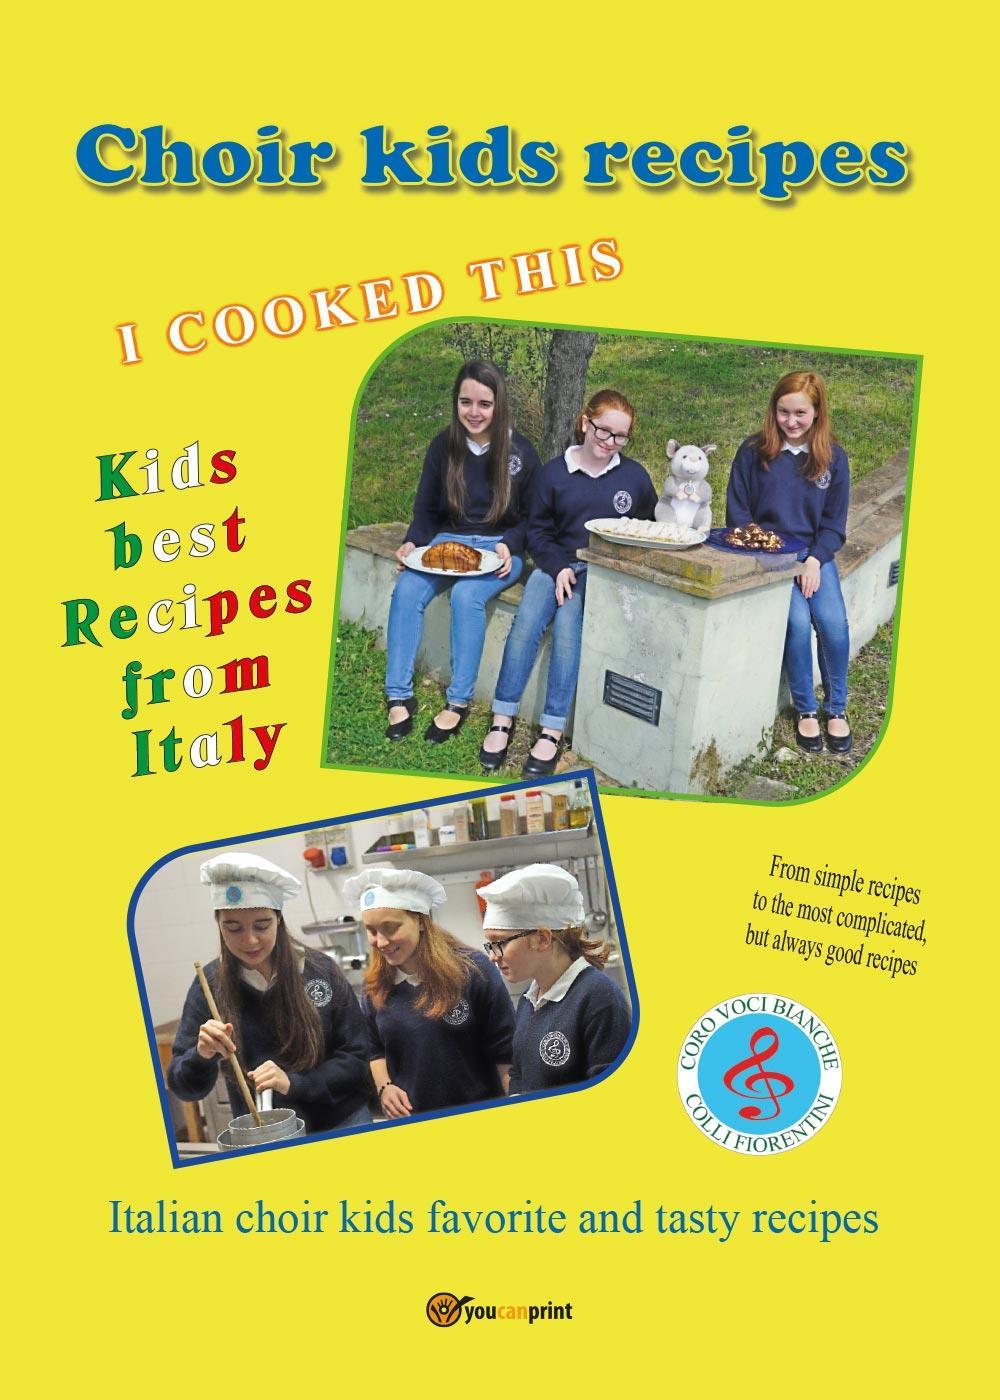 Choir kids recipes